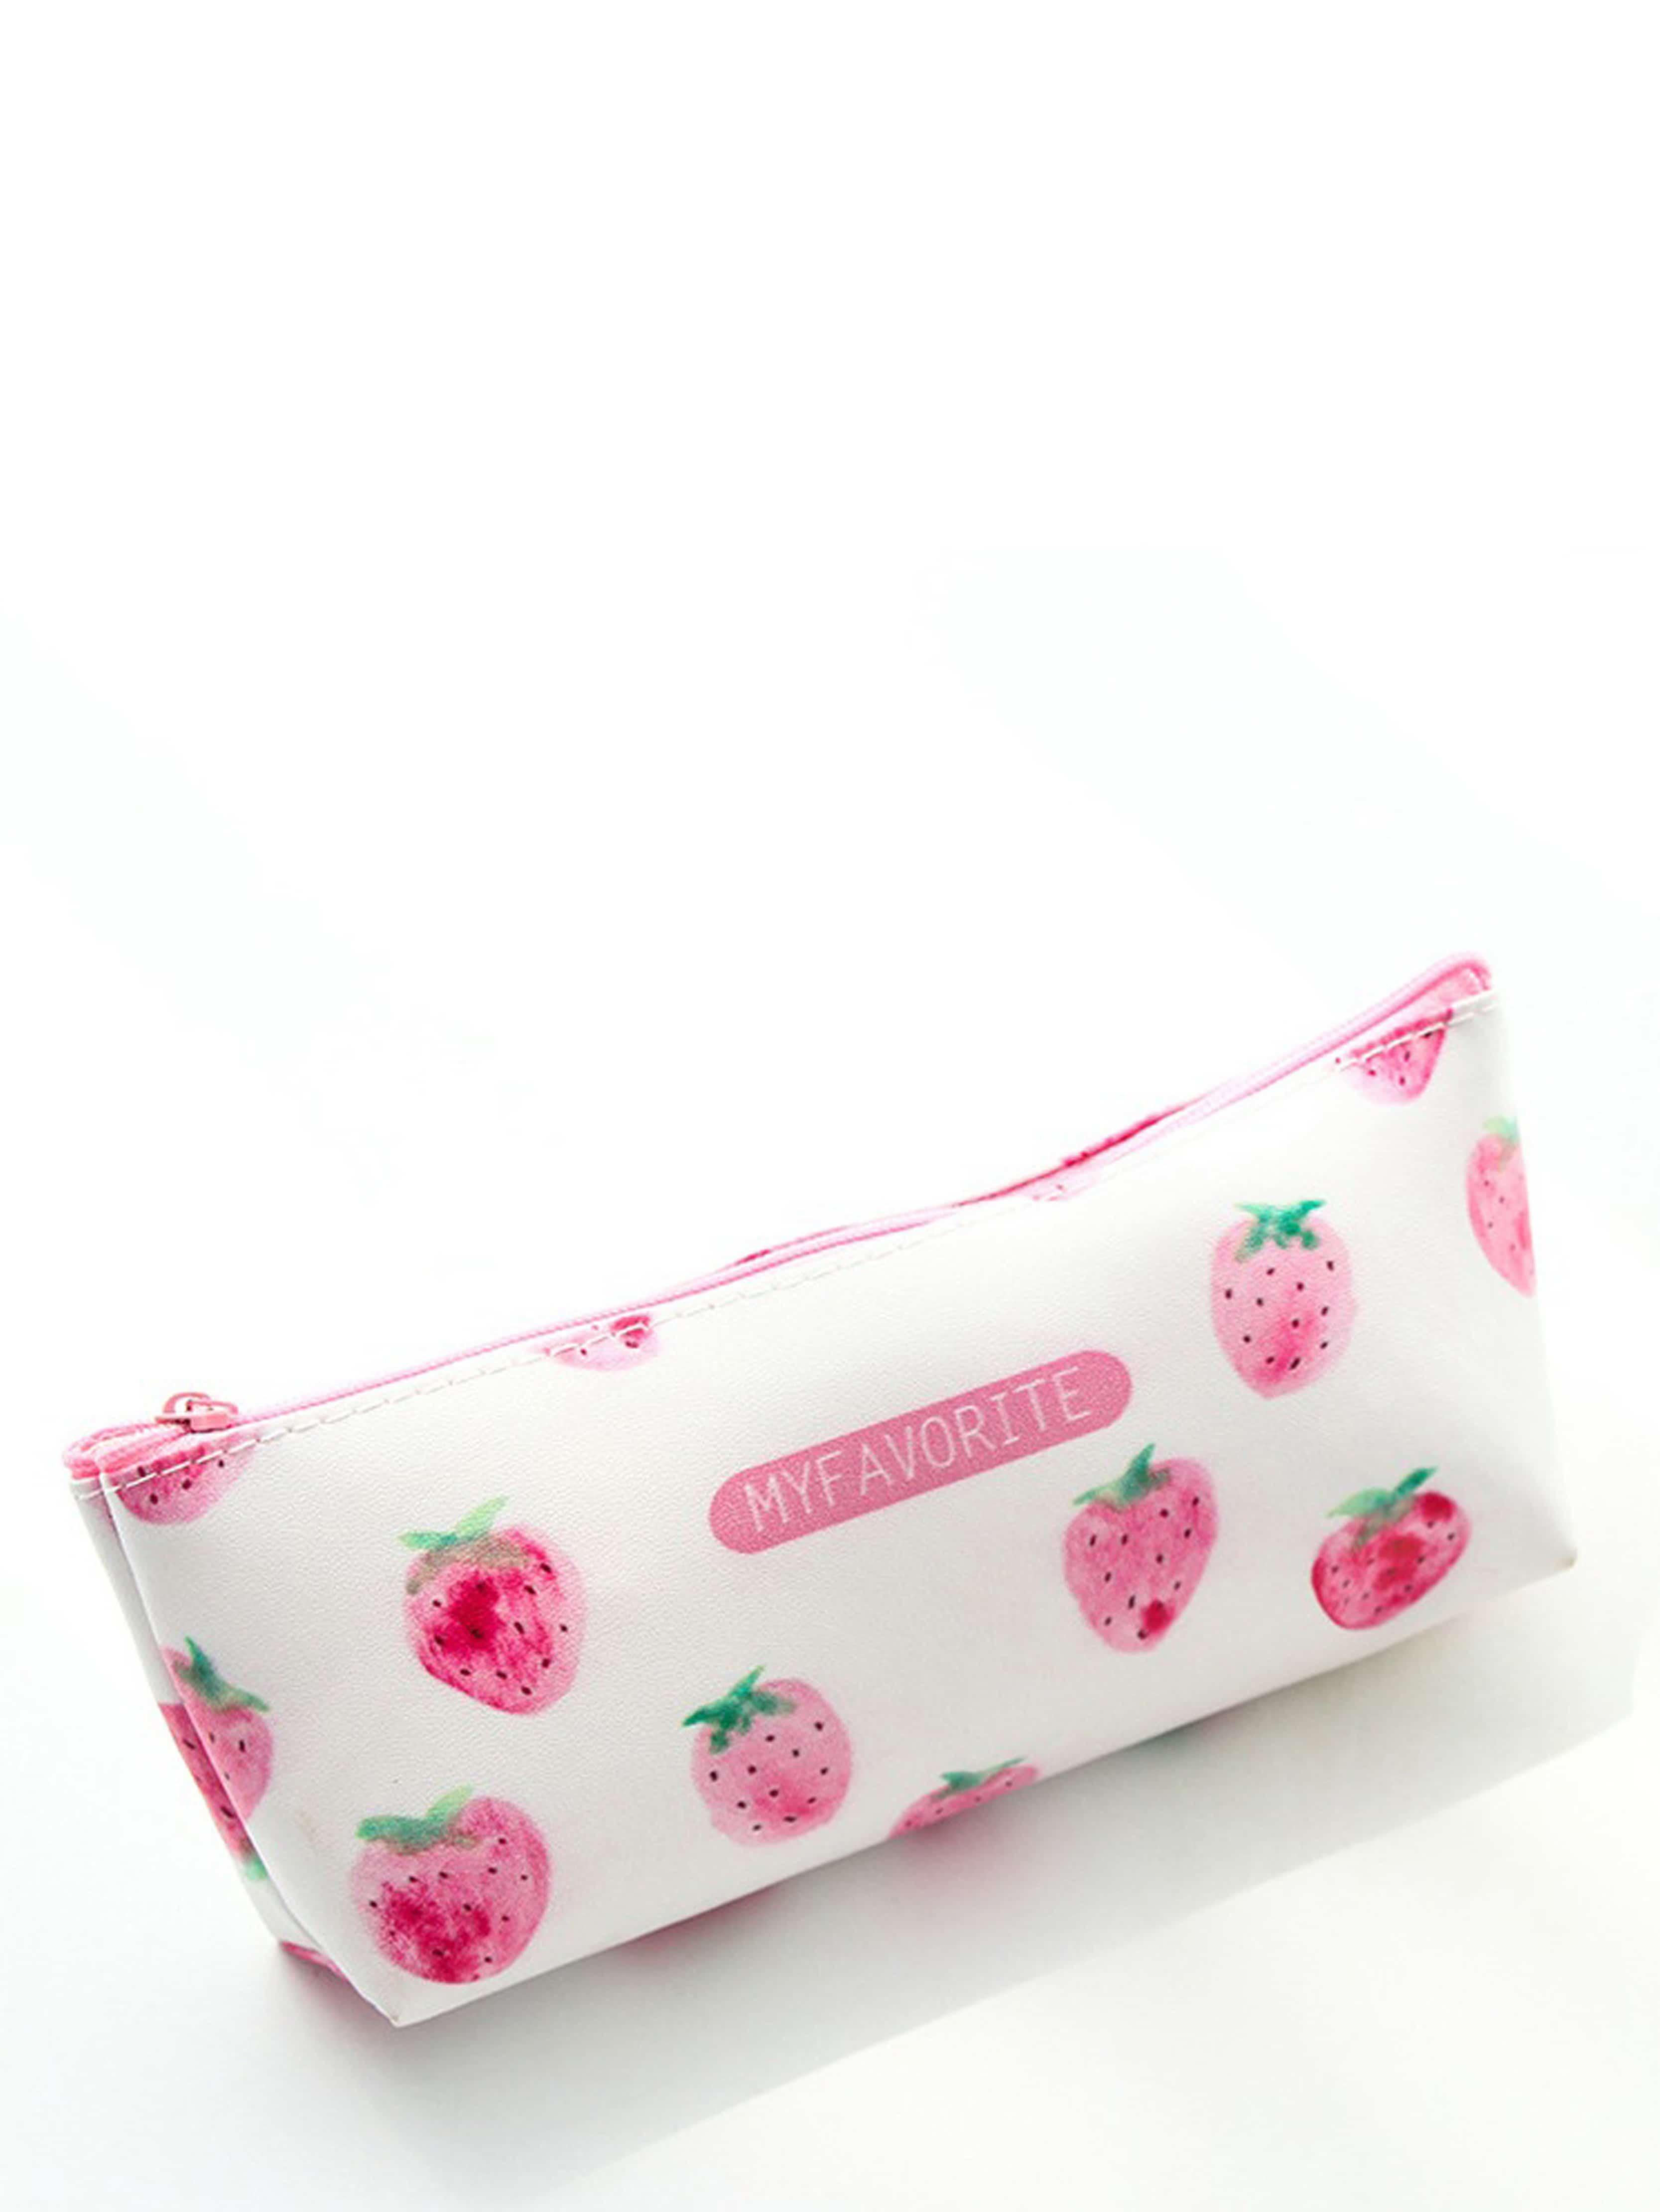 Strawberry Overlay Pencil Case strawberry overlay pencil case